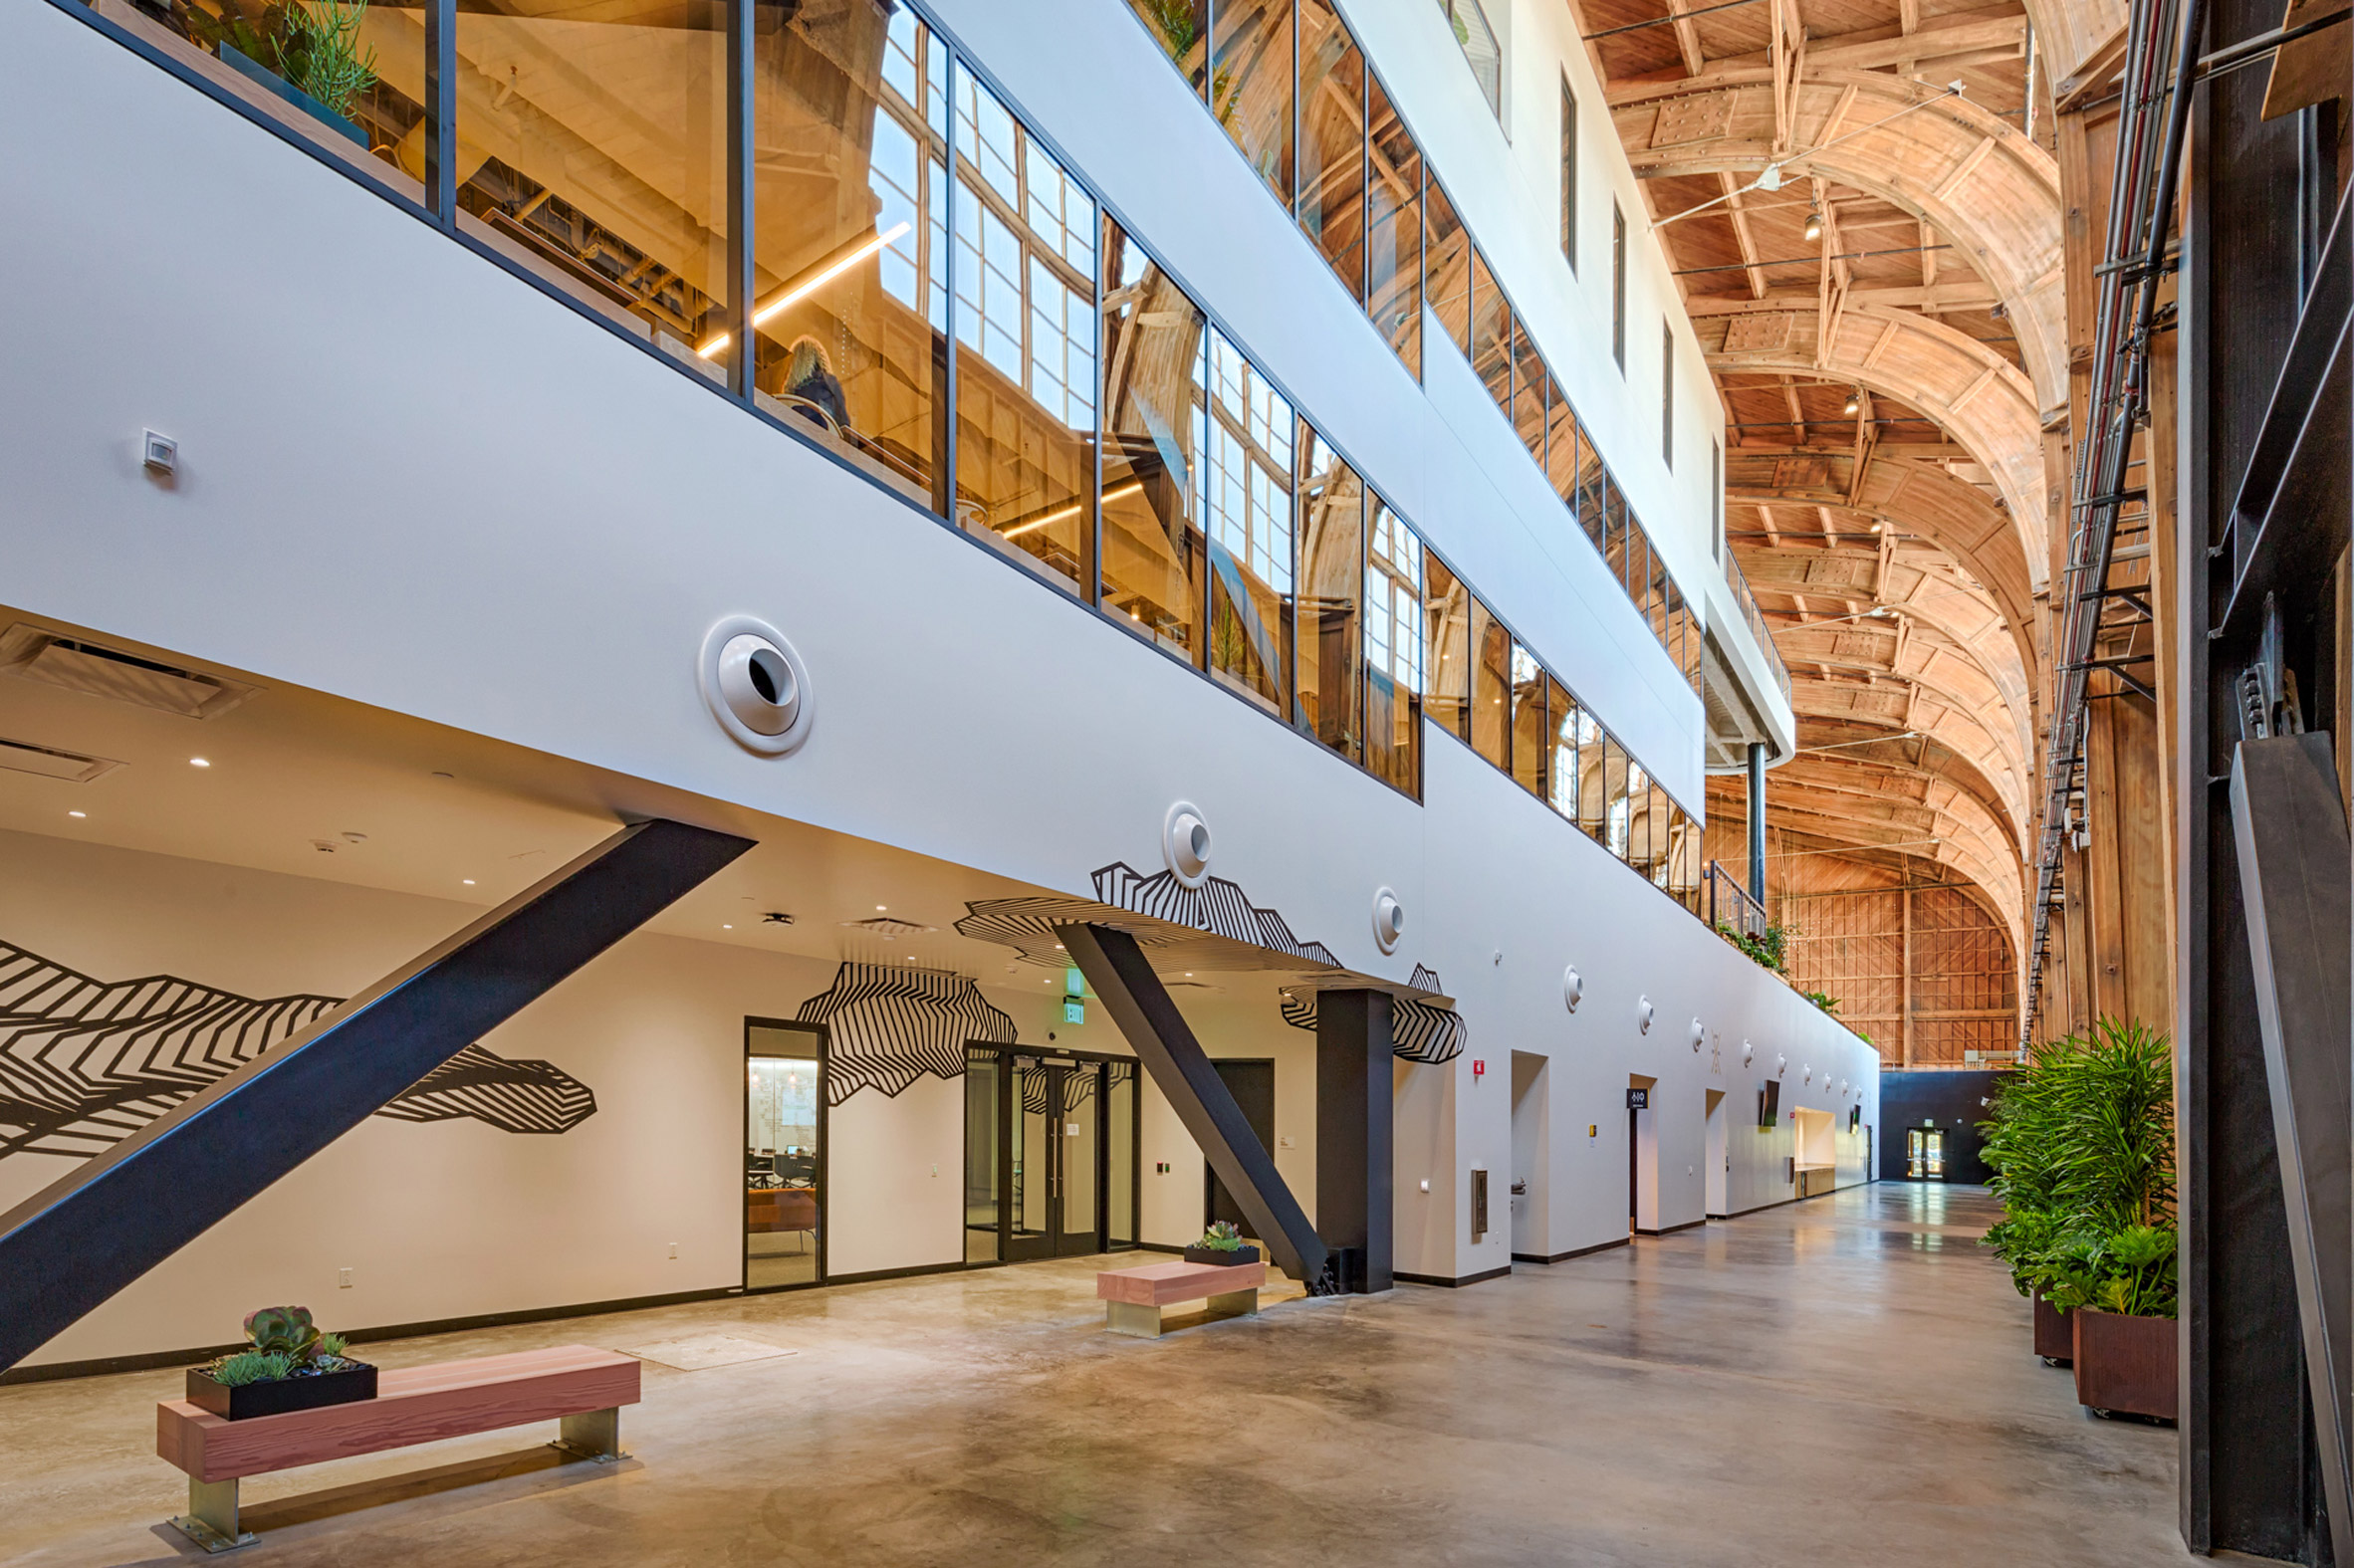 google-spruce-goose-hangar-architecture-zgf-los-angeles-california-usa_dezeen_2364_col_4.jpg